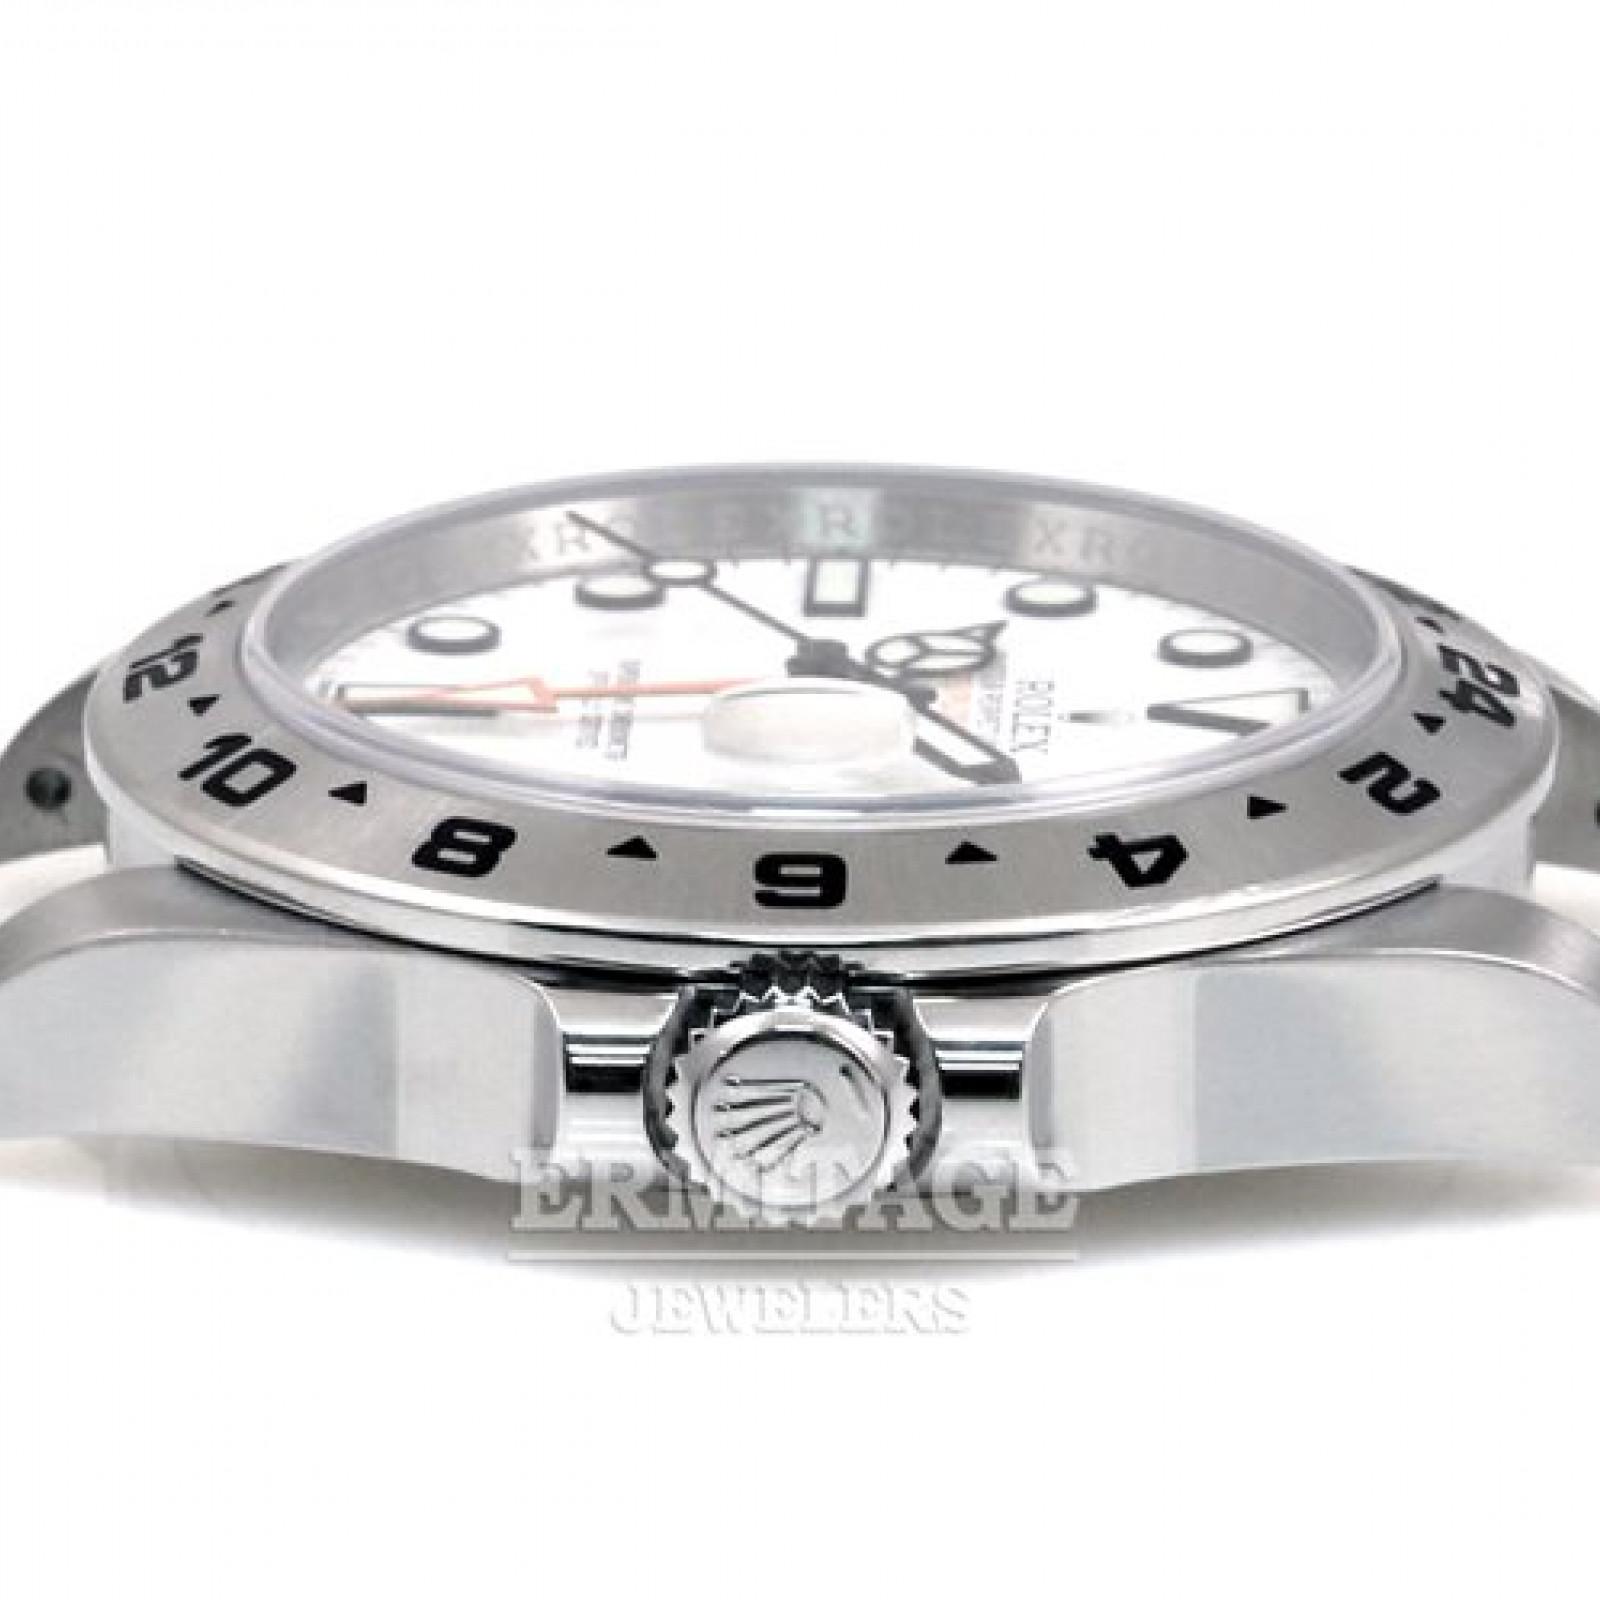 Rolex Explorer II 216570 Mint Condition 2011